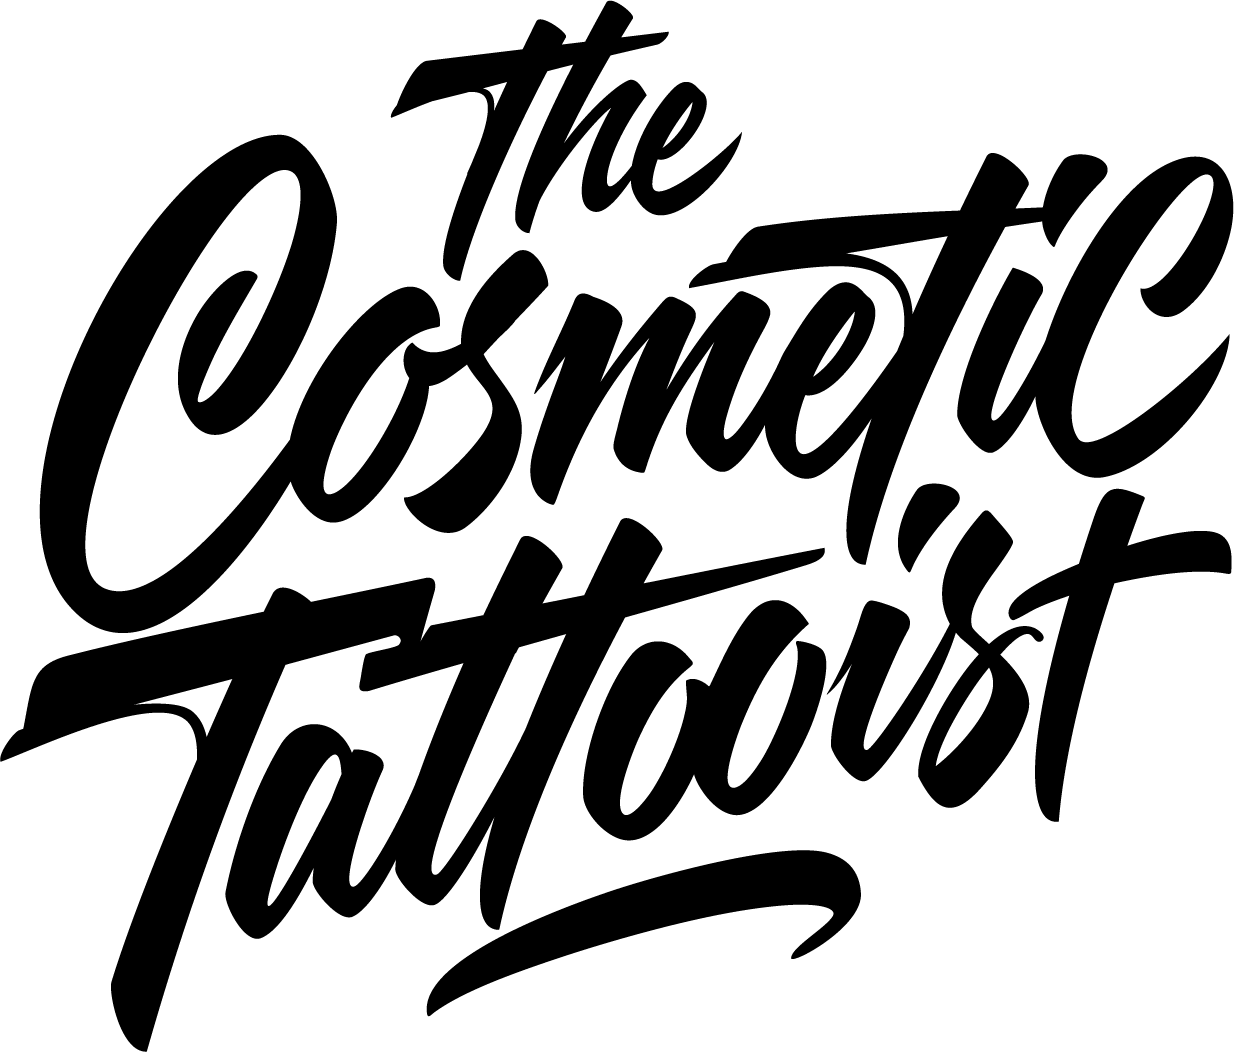 THE COSMETIC TATTOOIST